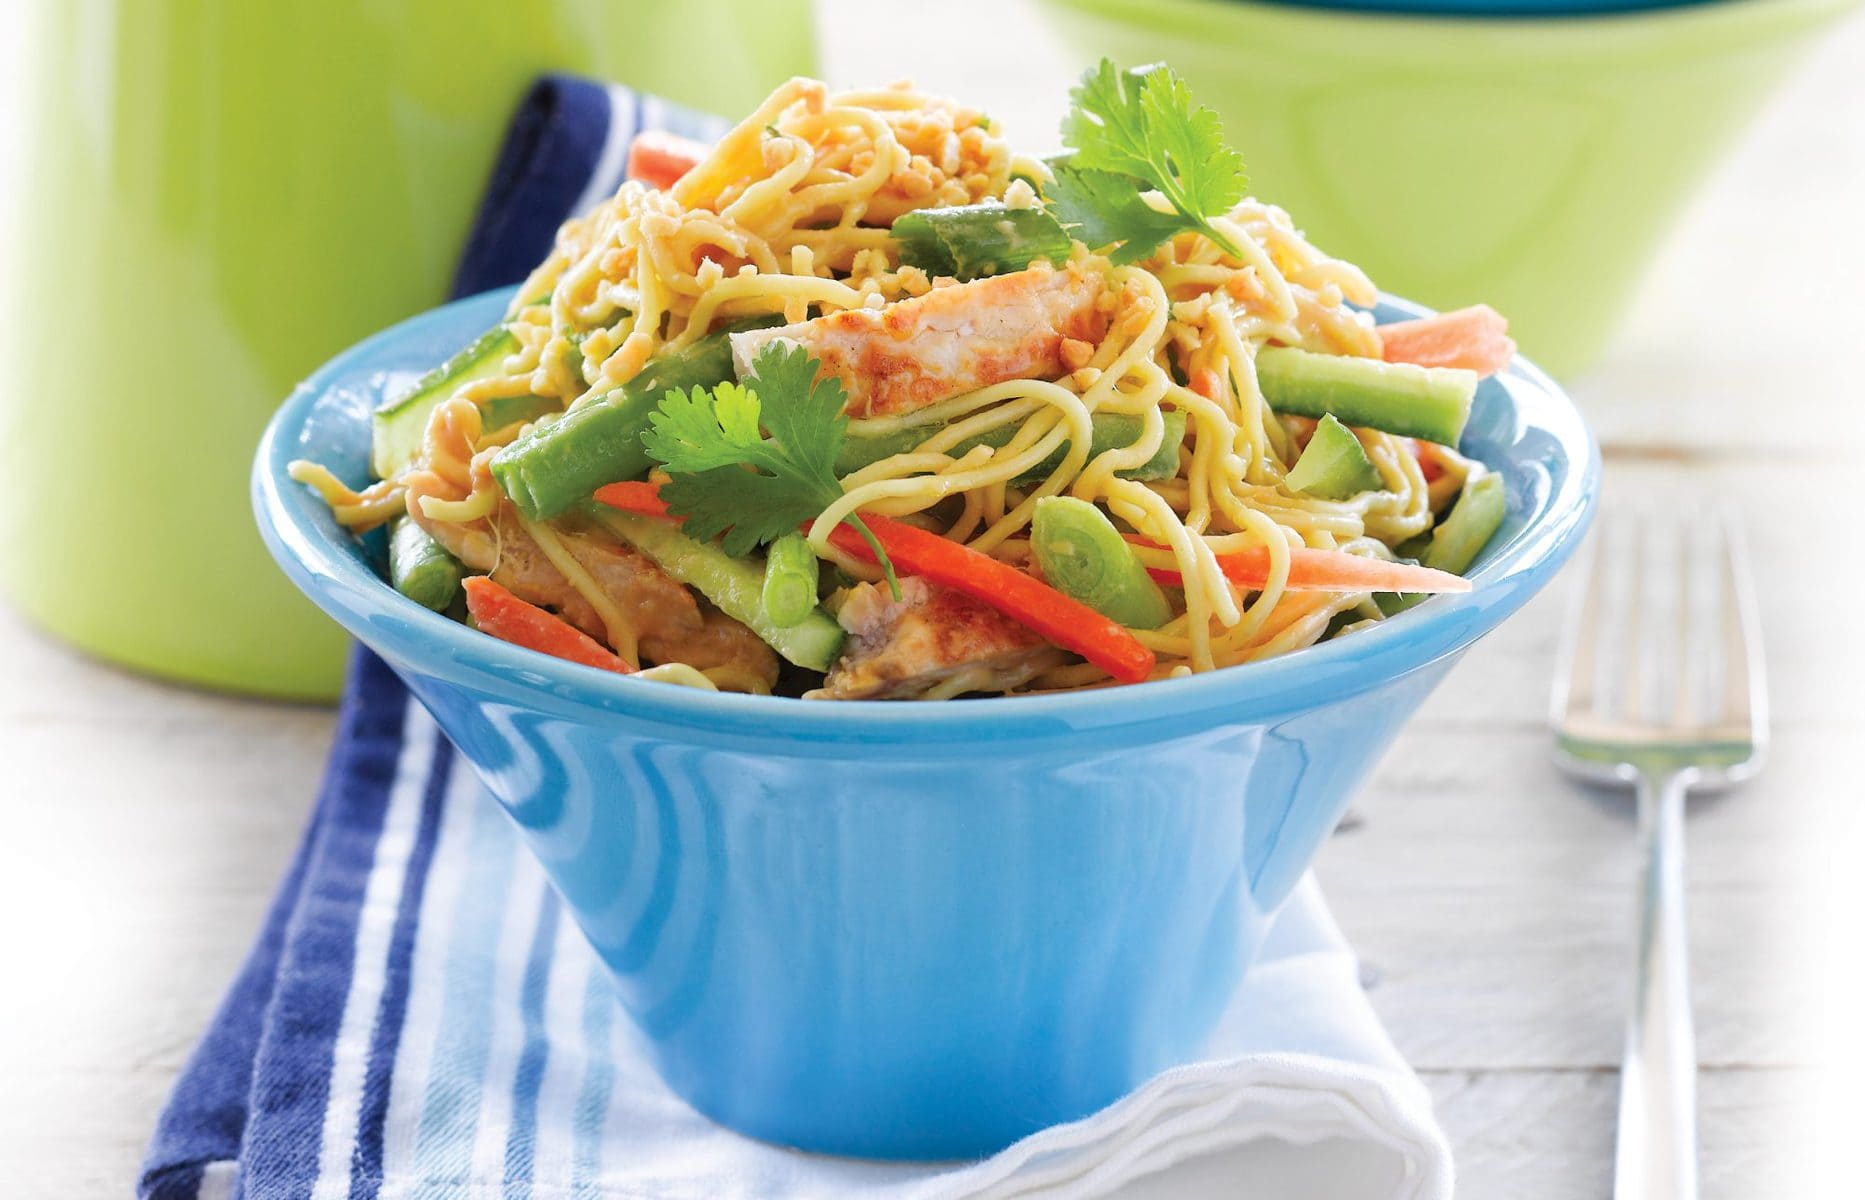 Peanut-chicken and noodle salad